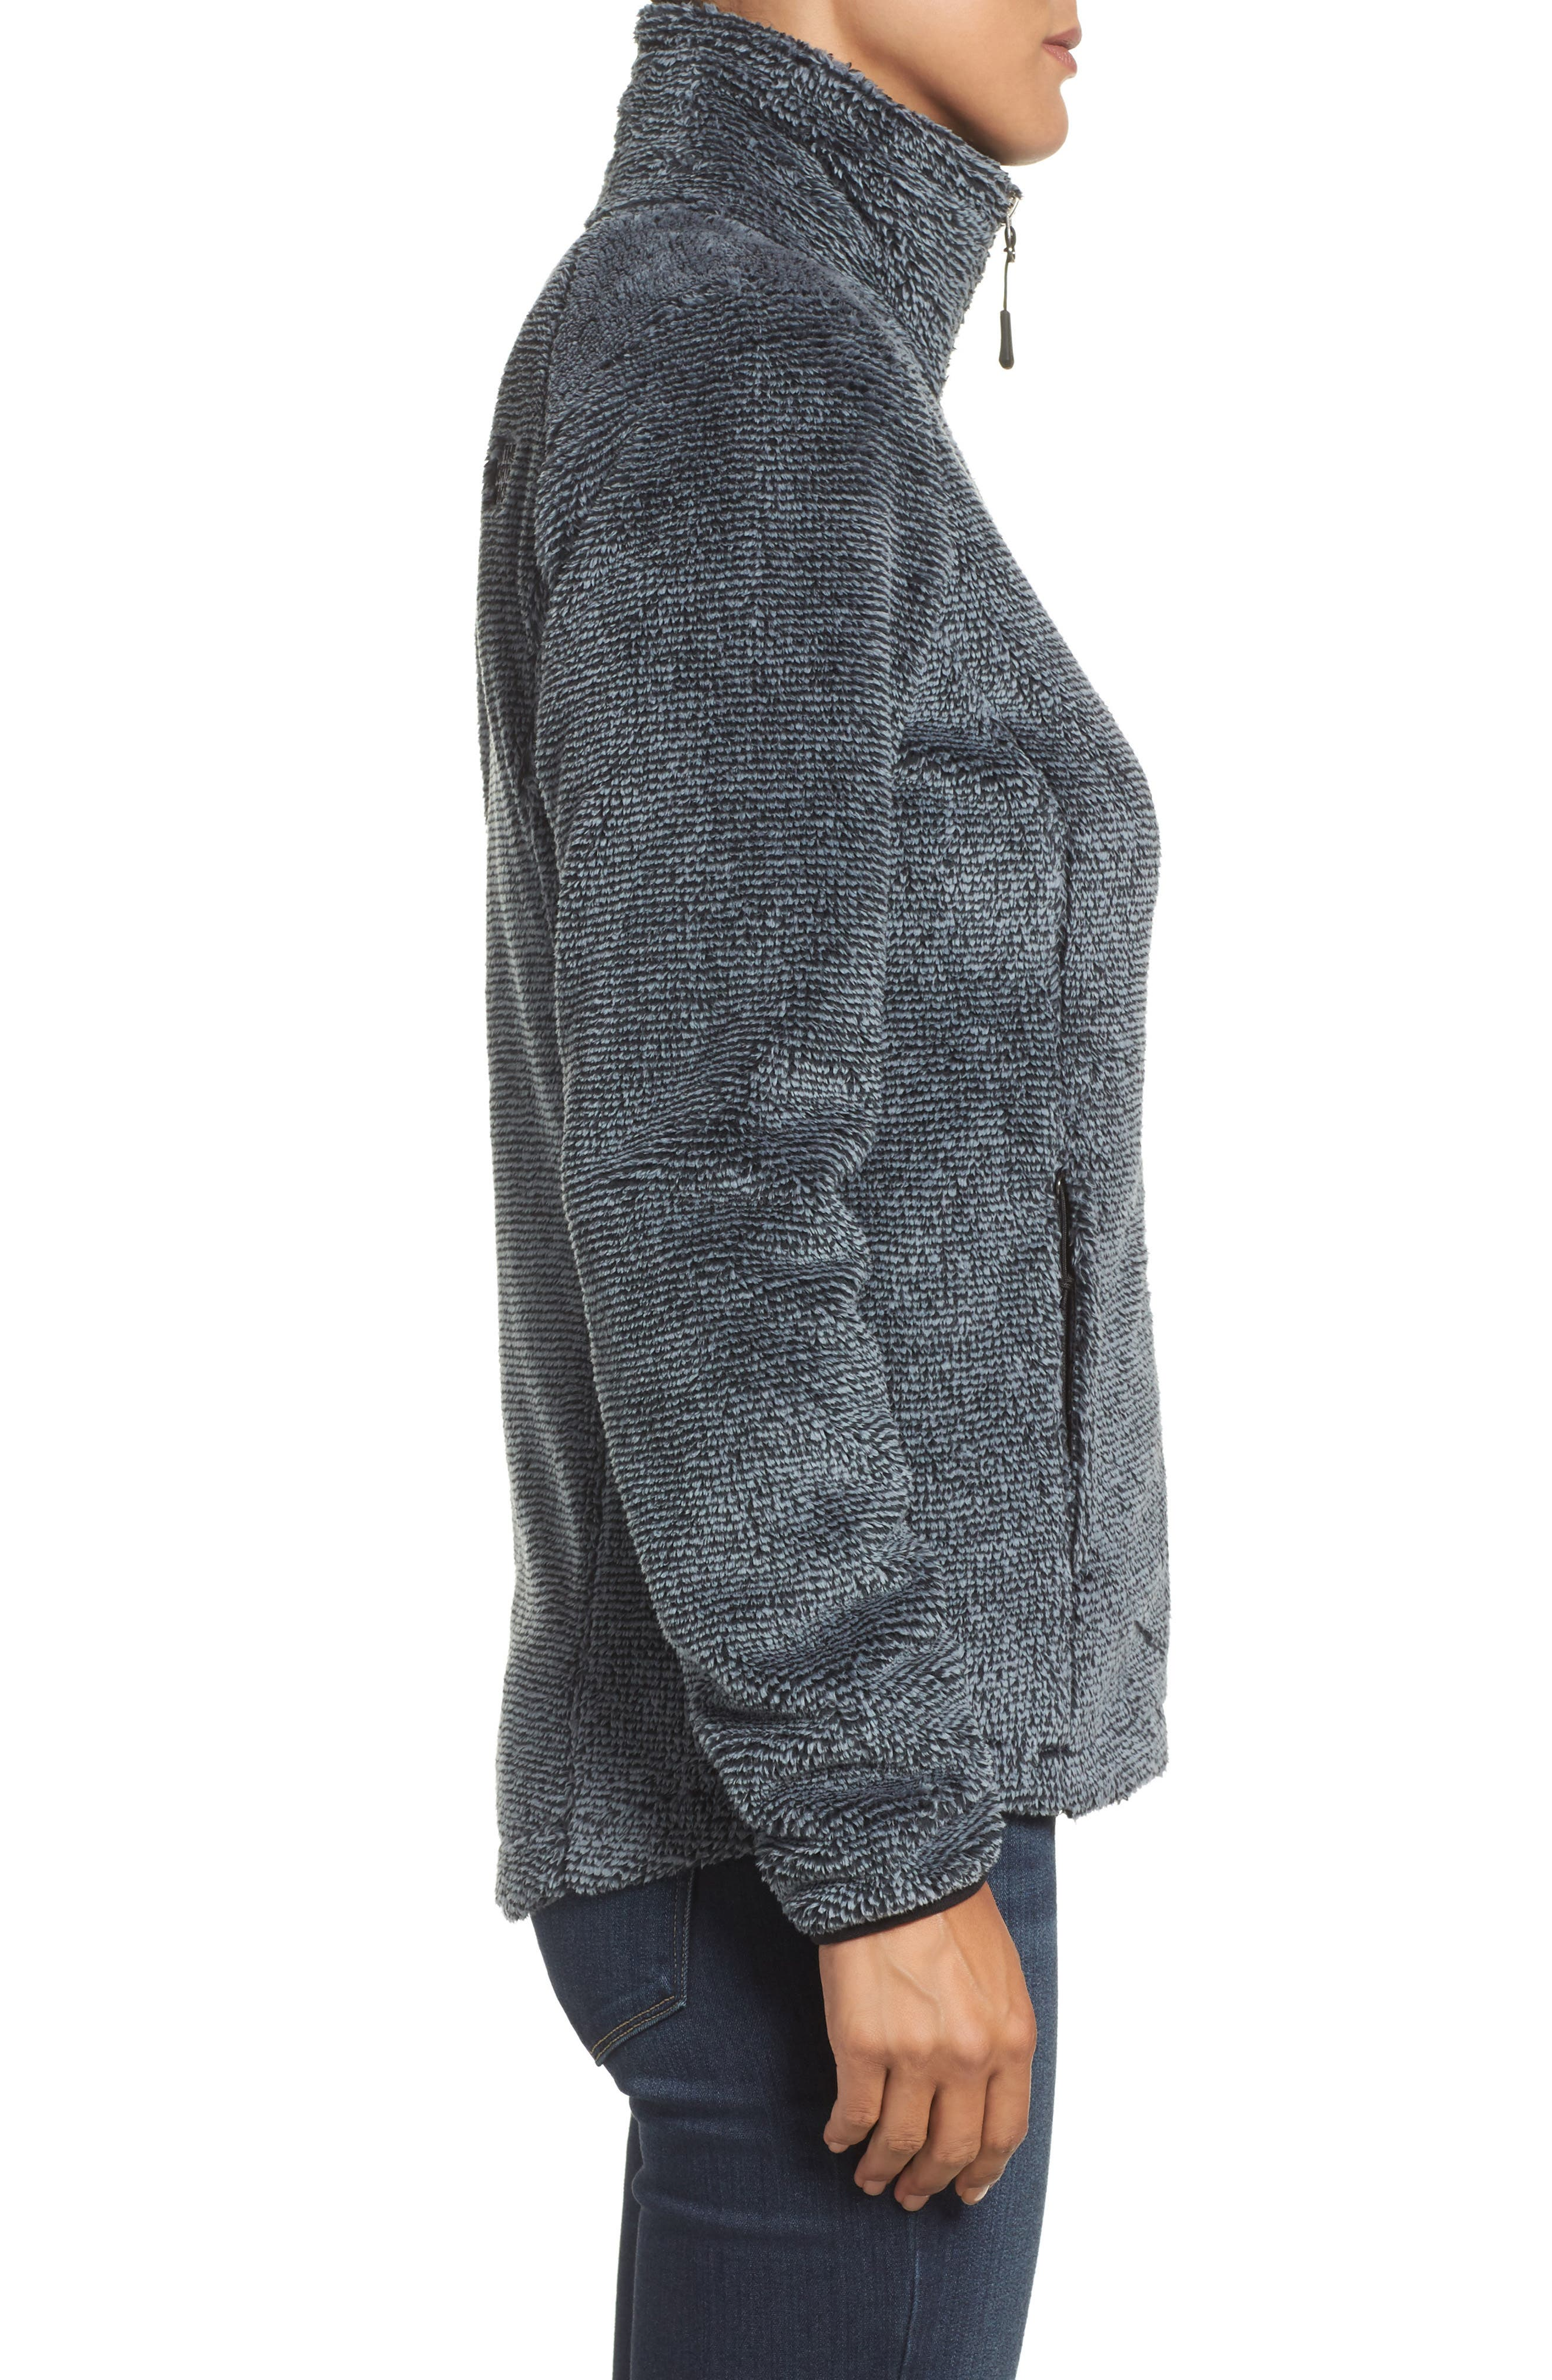 'Osito 2' Jacket,                             Alternate thumbnail 3, color,                             Tnf Black/ Mid Grey Stripe